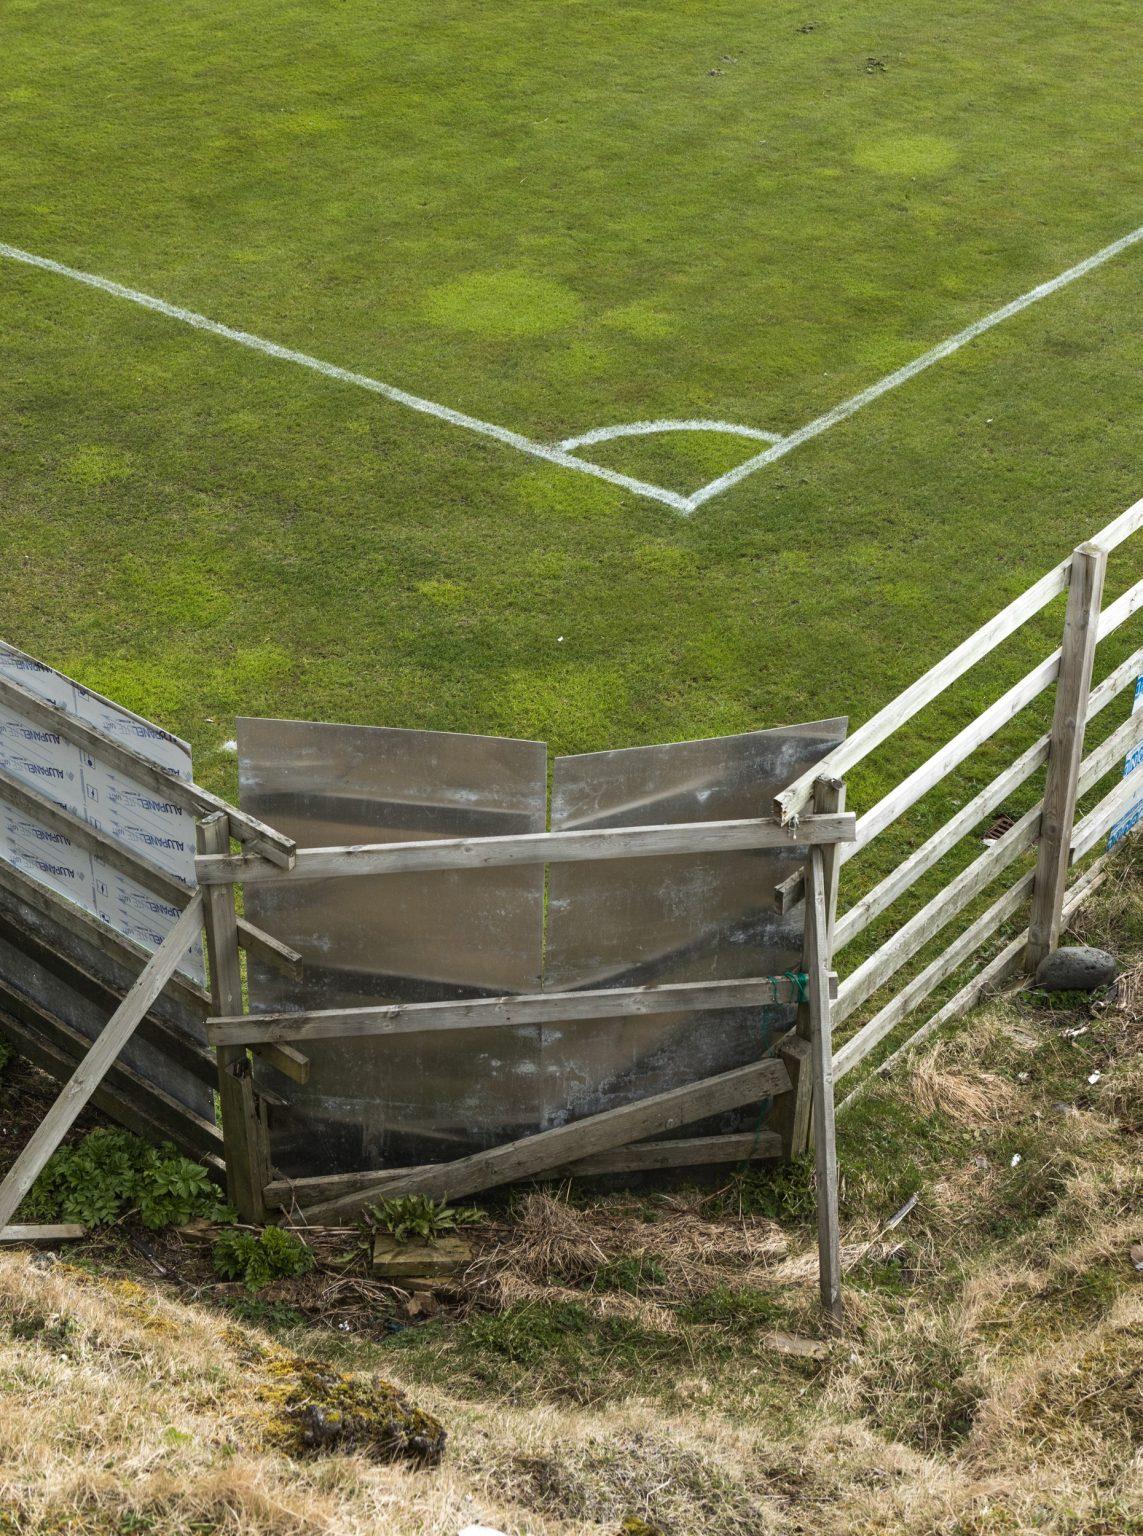 The IBV stadium is in Heimaey, an island of four thousand inhabitants in the Vestman archipelago. Vestmannaeyjar, Iceland, 2018.